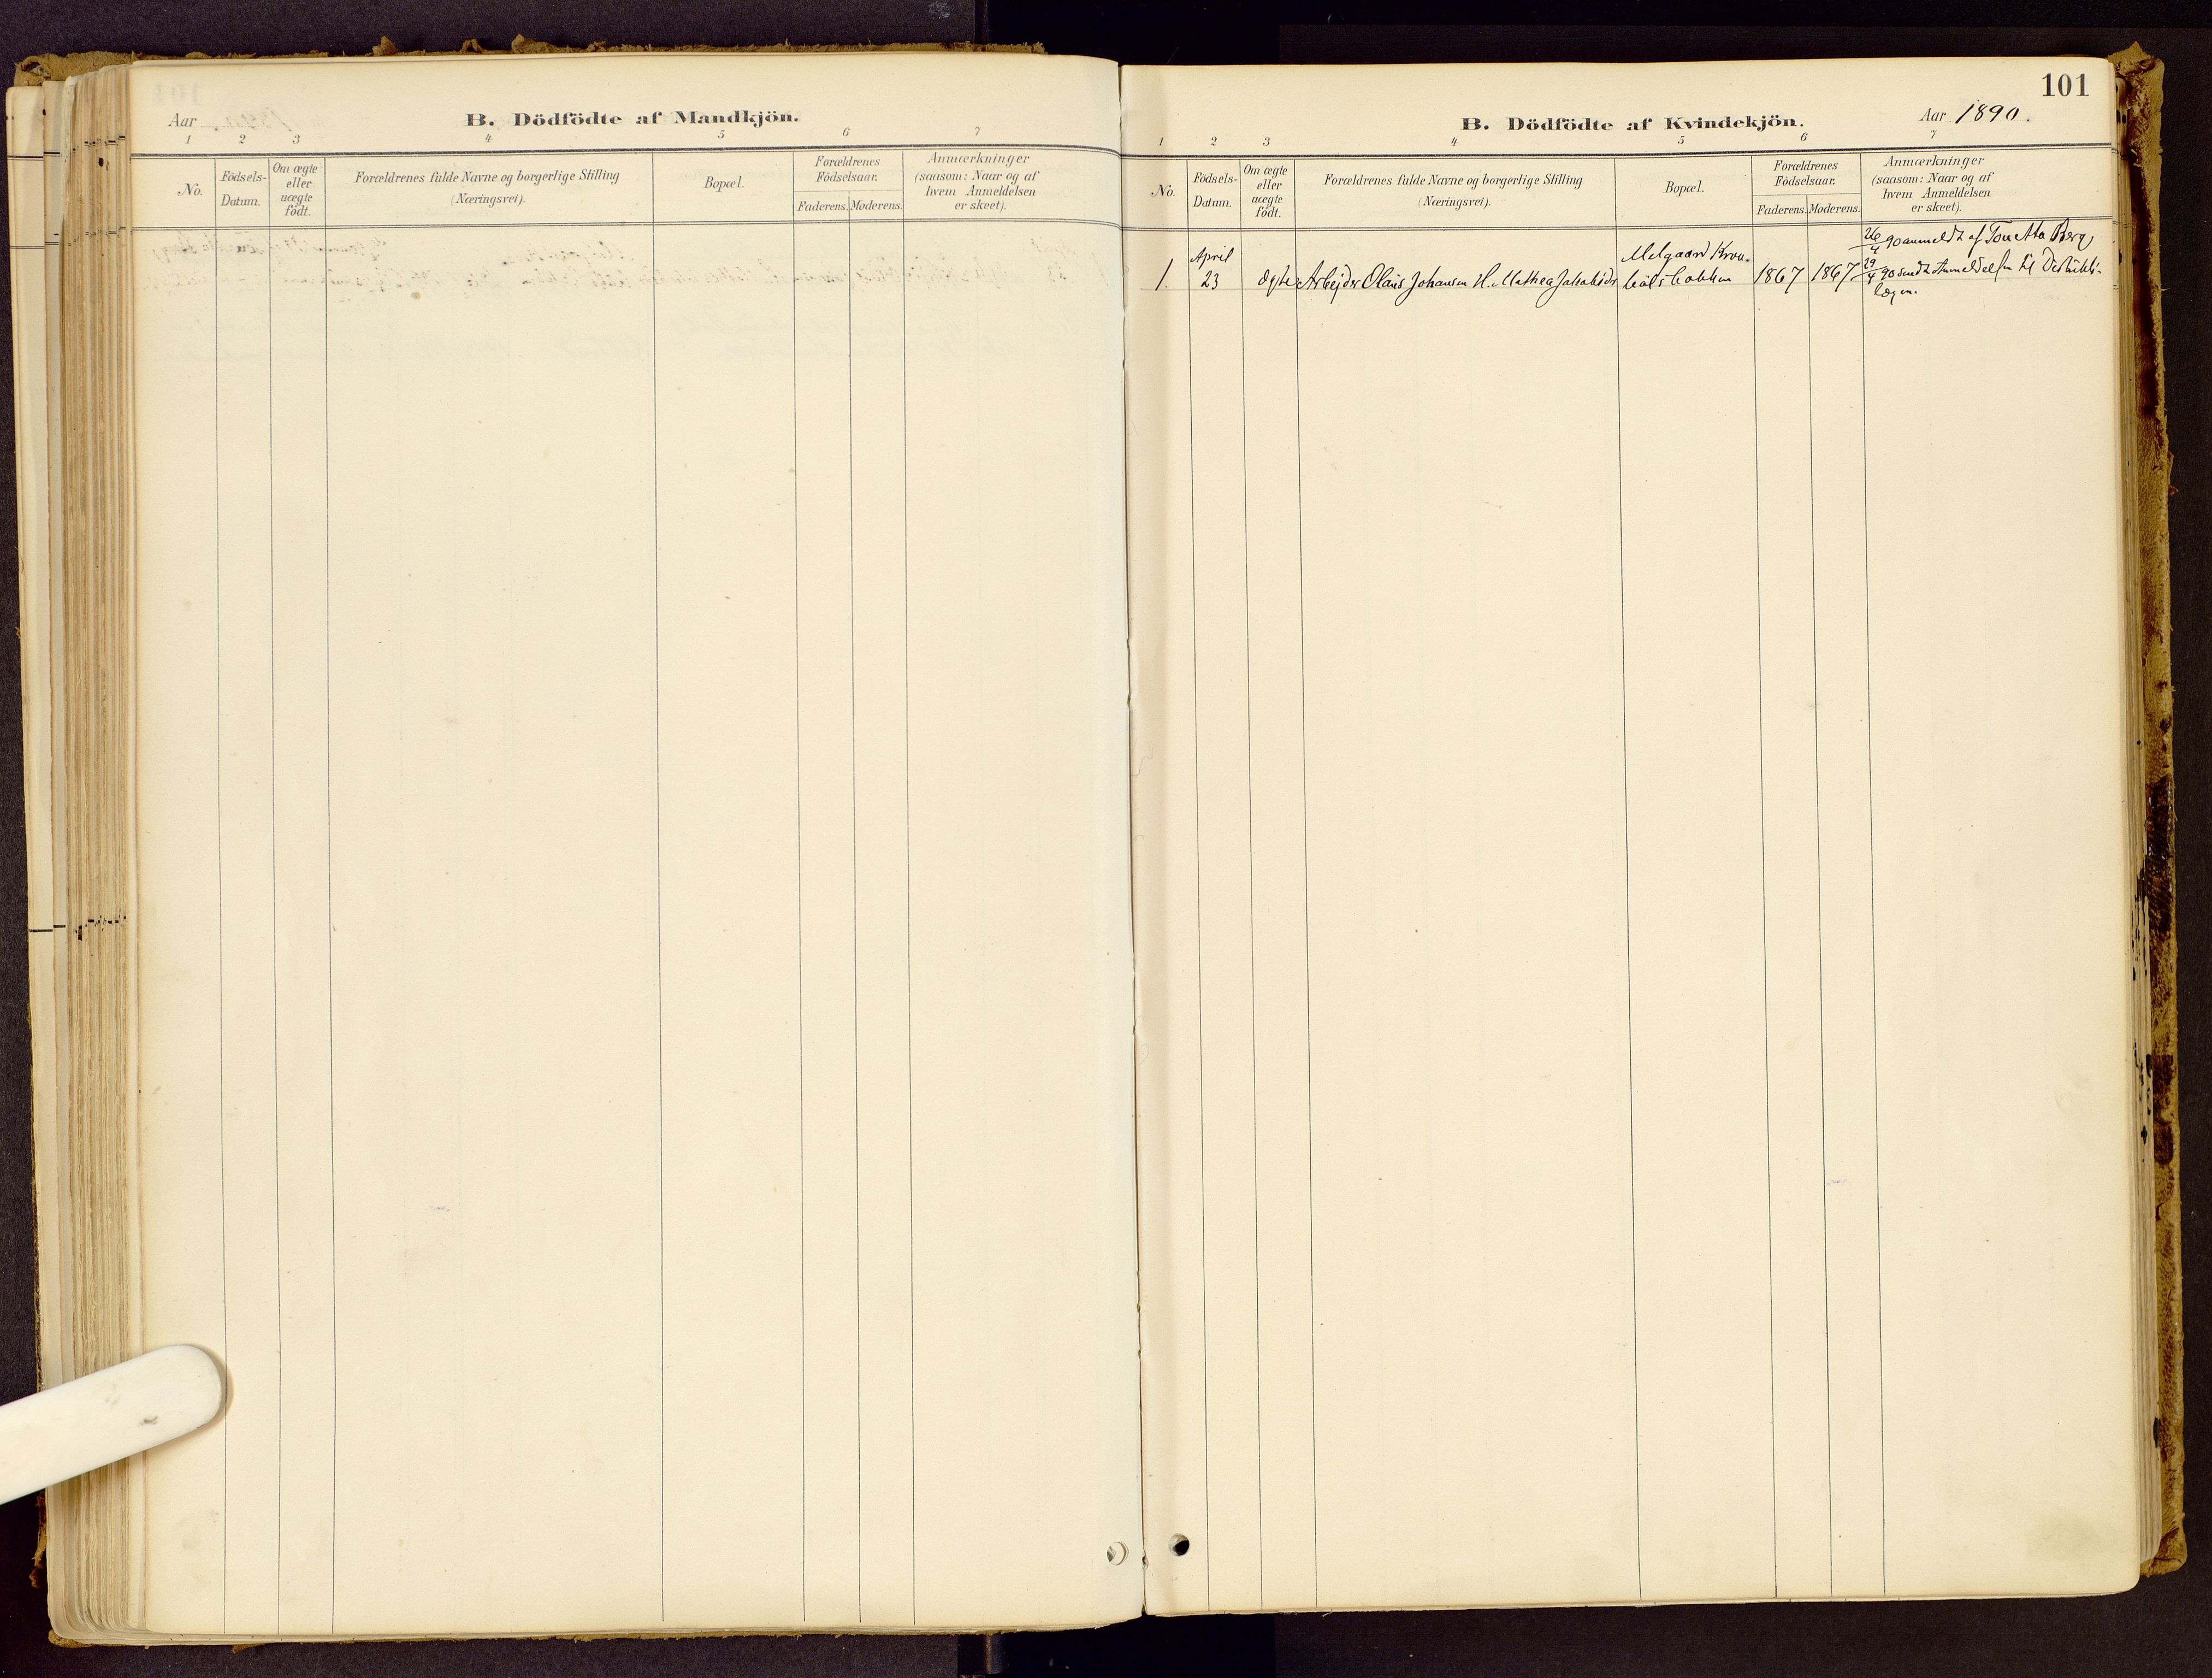 SAH, Vestre Gausdal prestekontor, Ministerialbok nr. 1, 1887-1914, s. 101